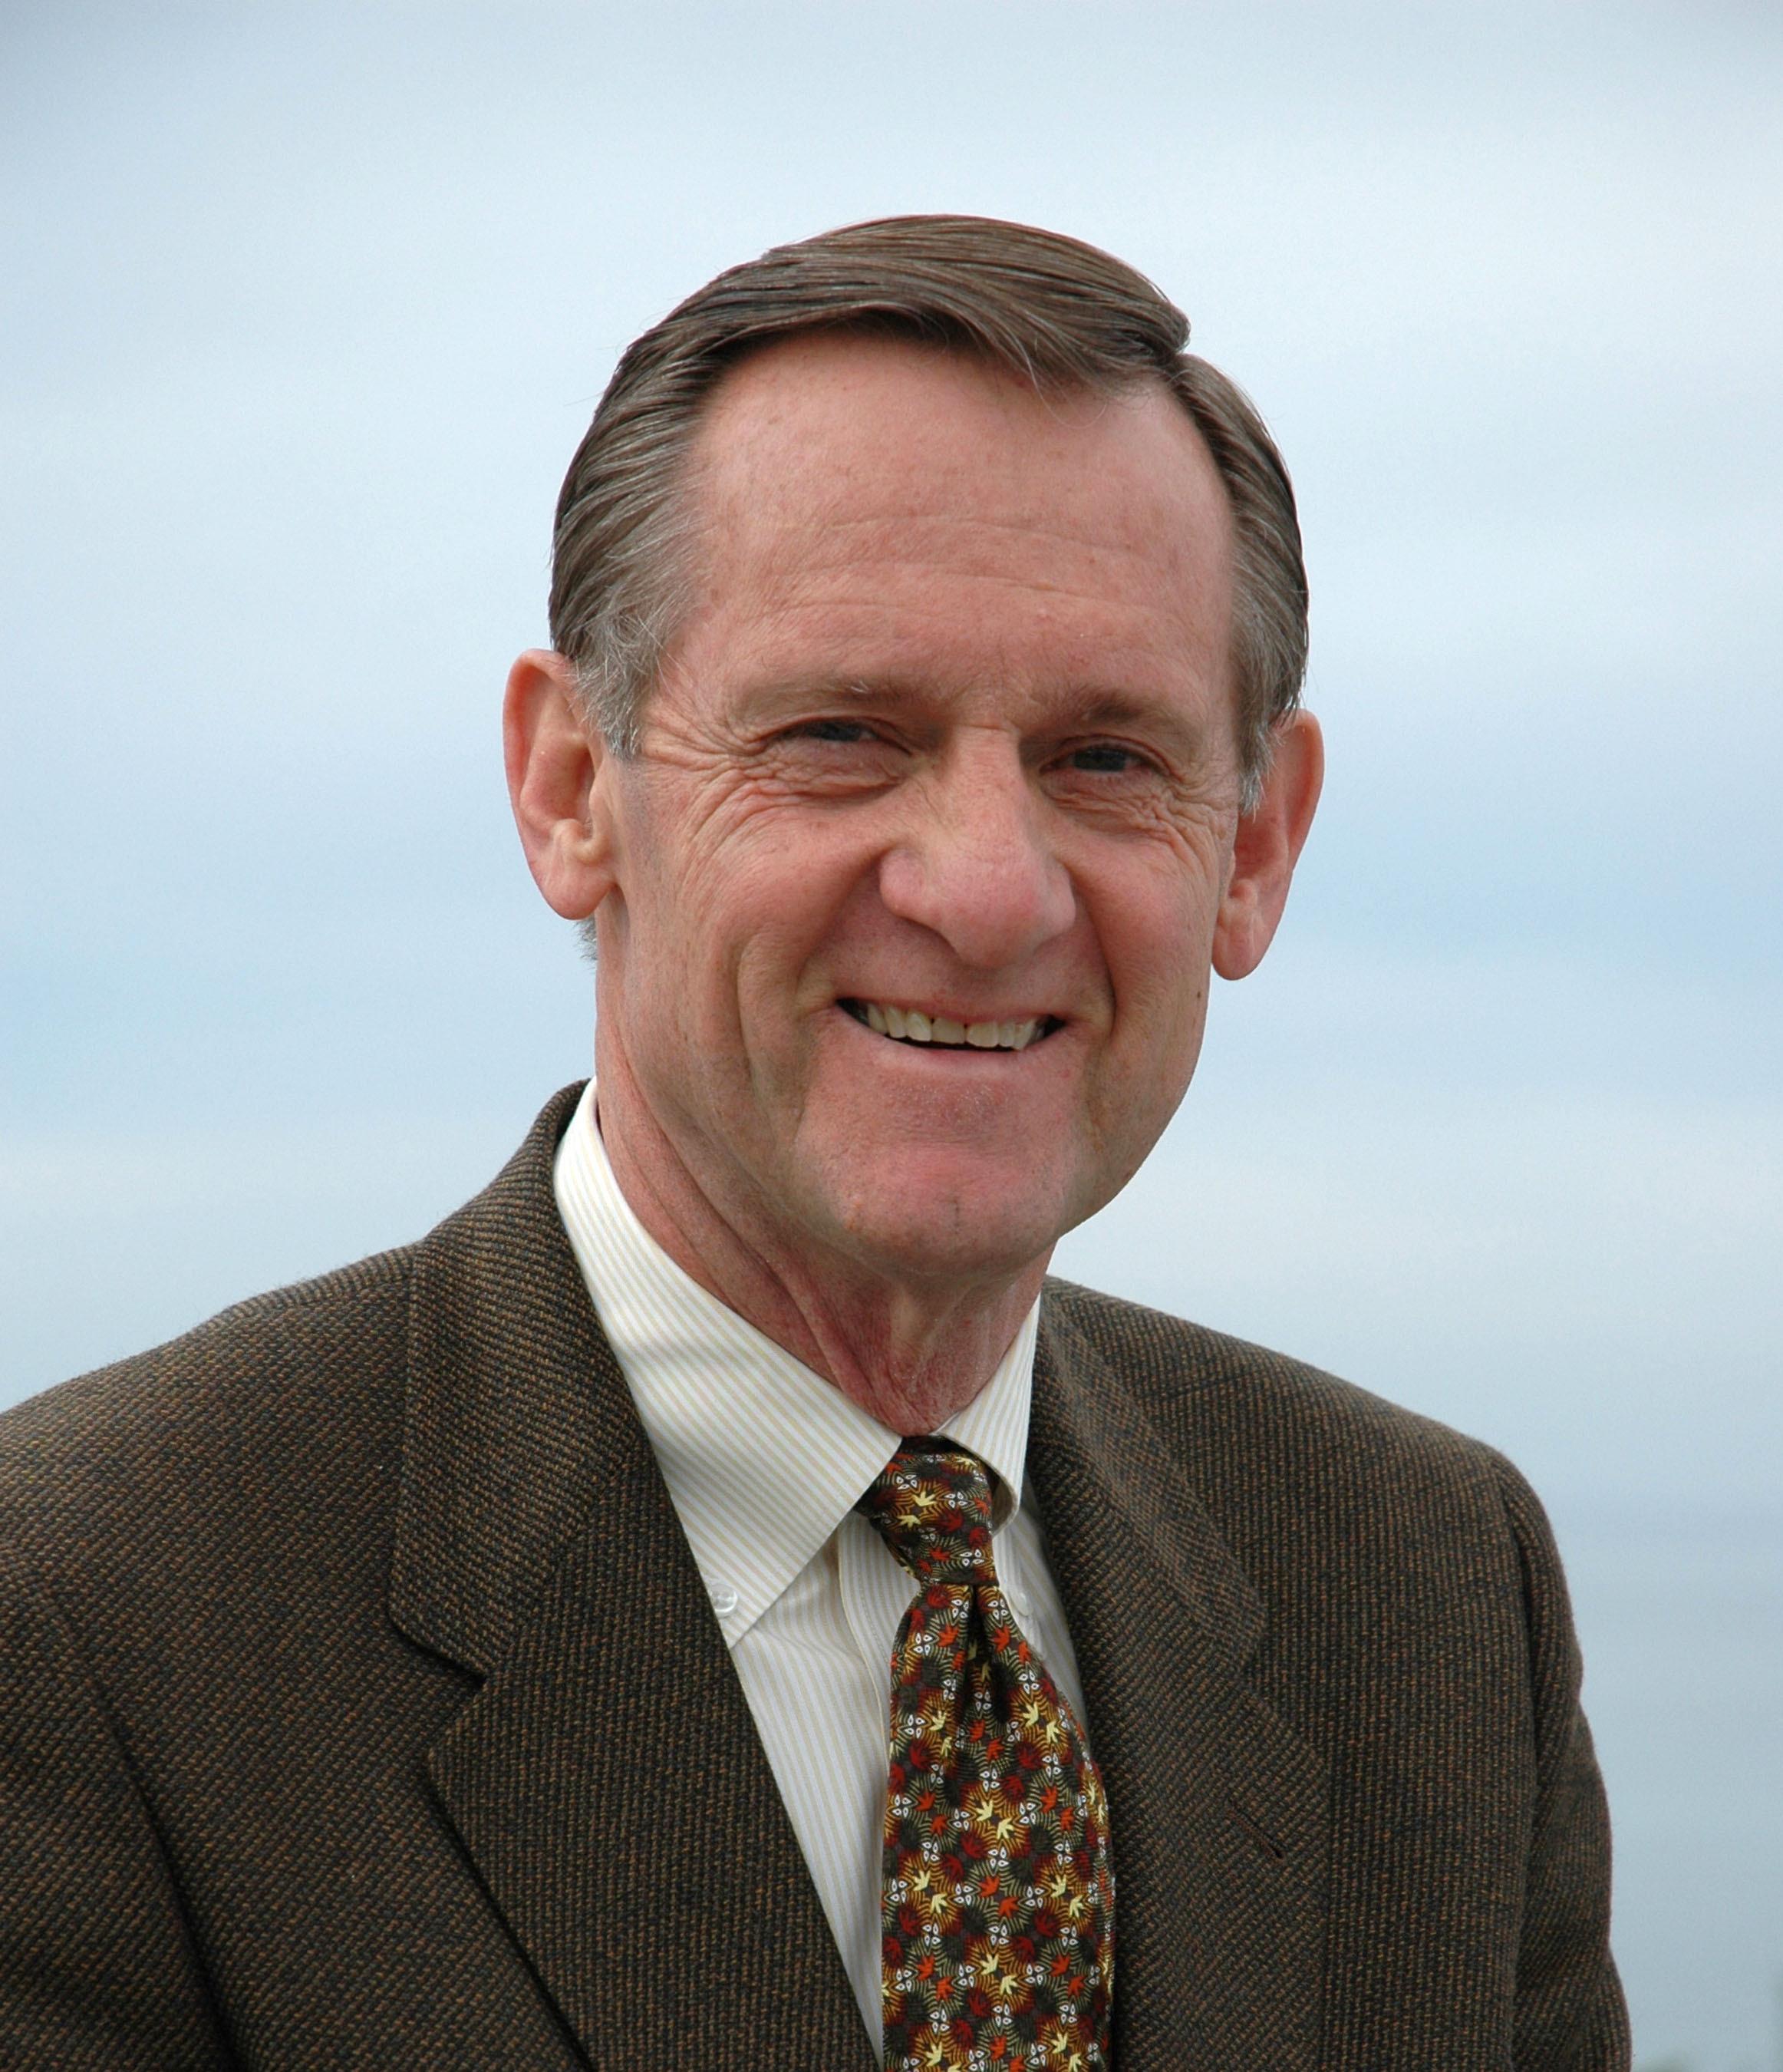 Adm. Archie Clemins, USN (ret.) Joins Thinklogical Advisory Board.  (PRNewsFoto/Thinklogical)